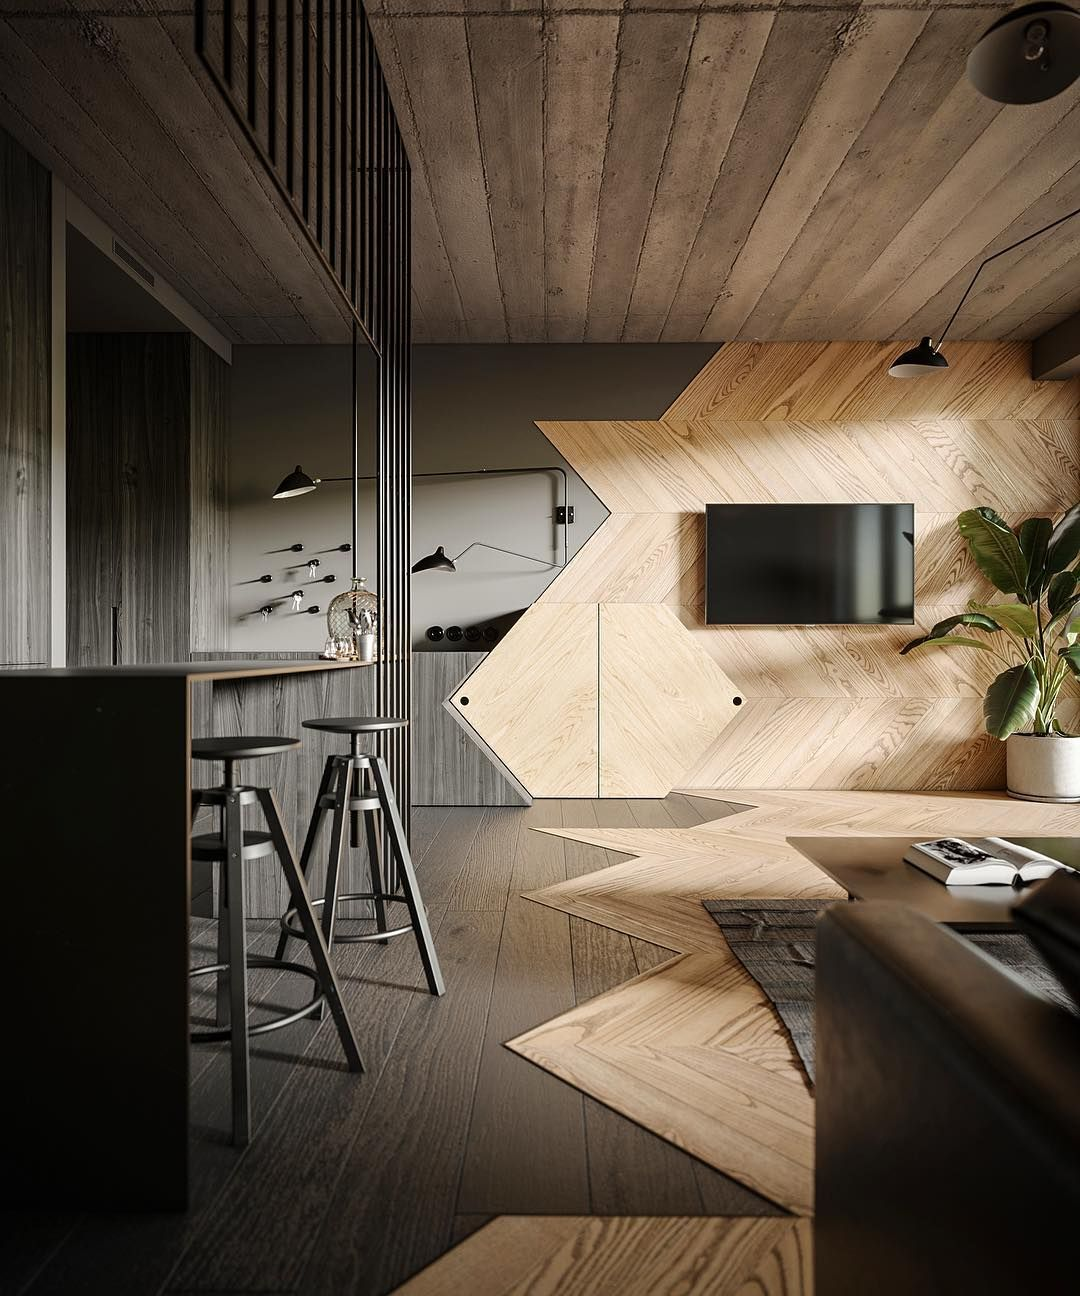 Interior Design Architecture On Instagram Describe This